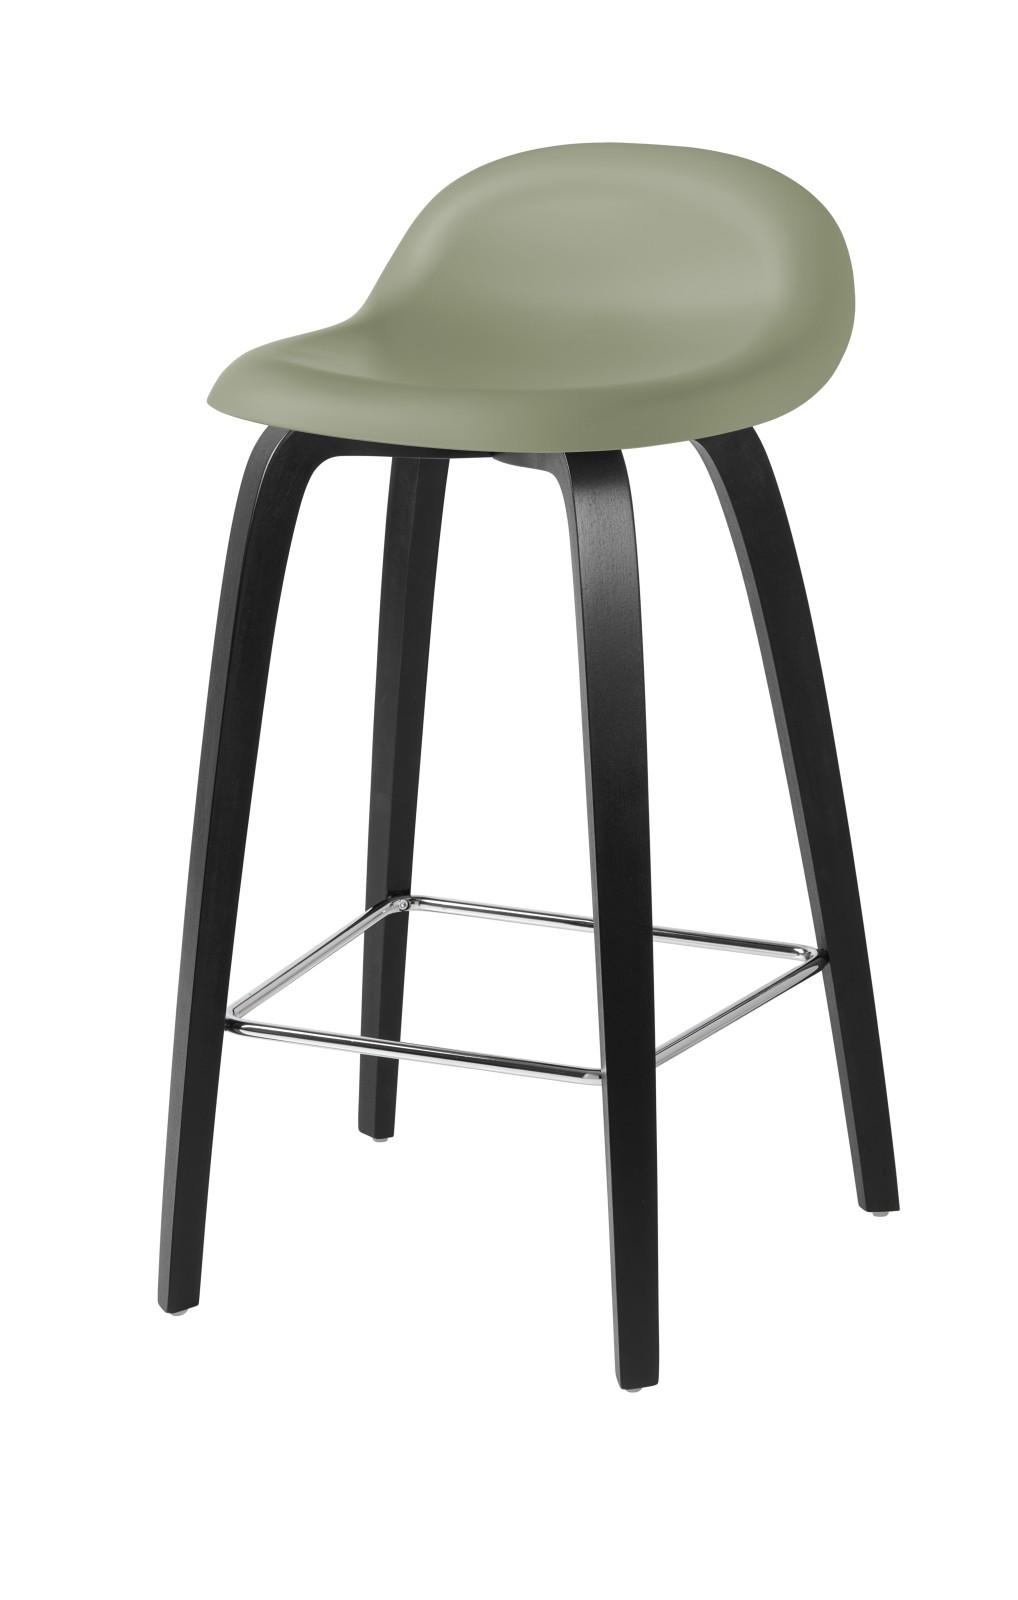 Gubi 3D Wood Base Counter Stool - Unupholstered Gubi HiRek Mistletoe, Gubi Wood Black Stained Beech